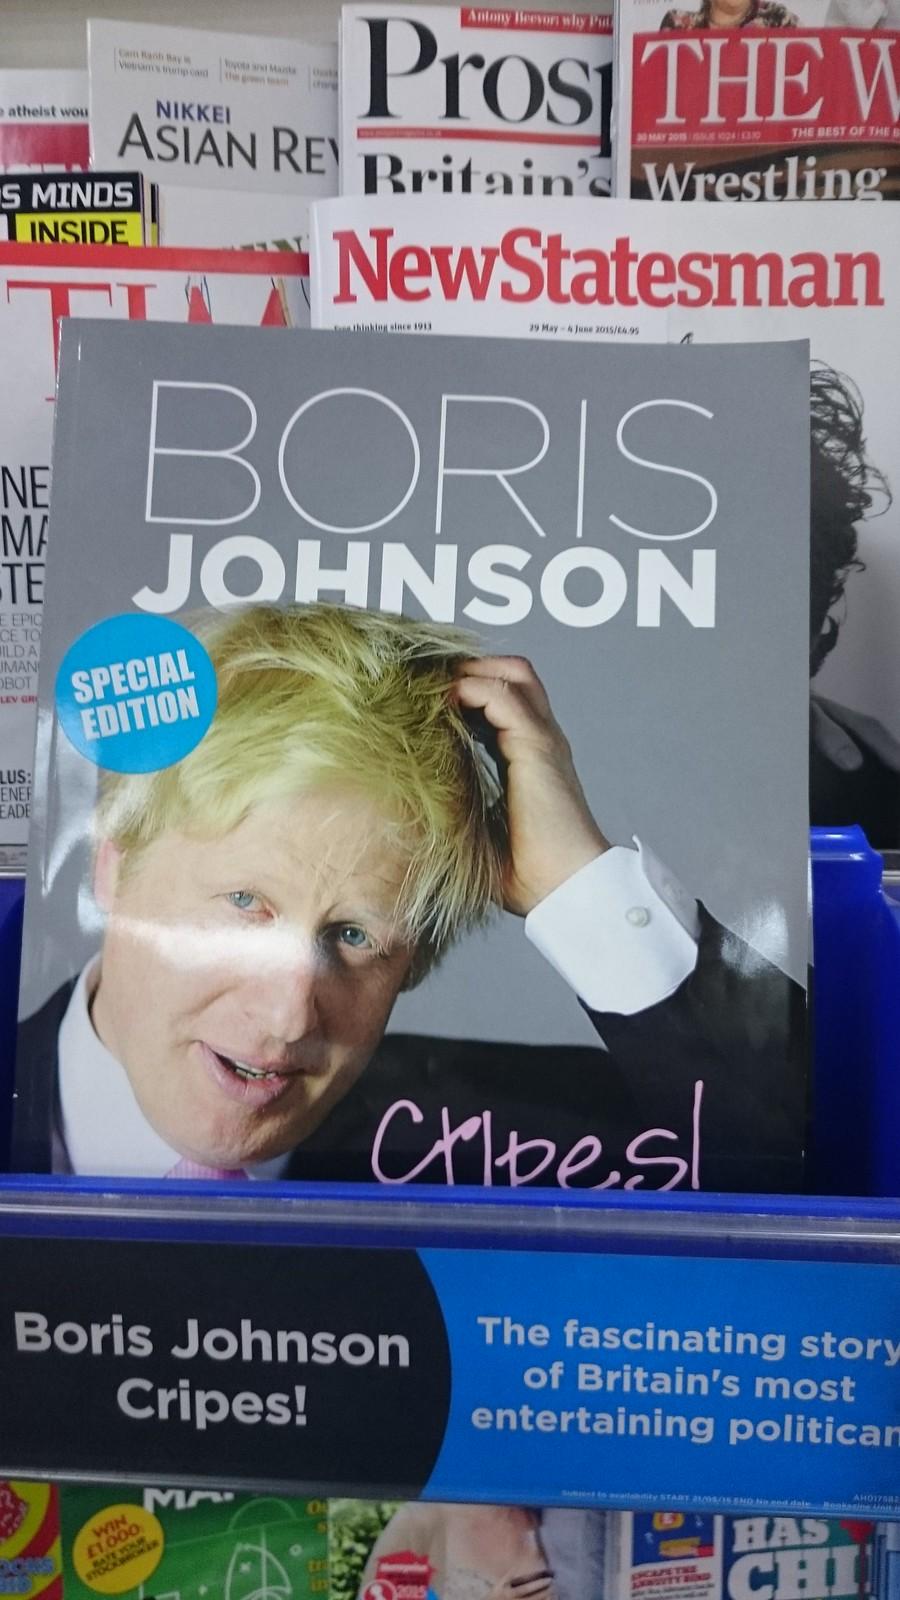 Boris Johnson - Cripes!